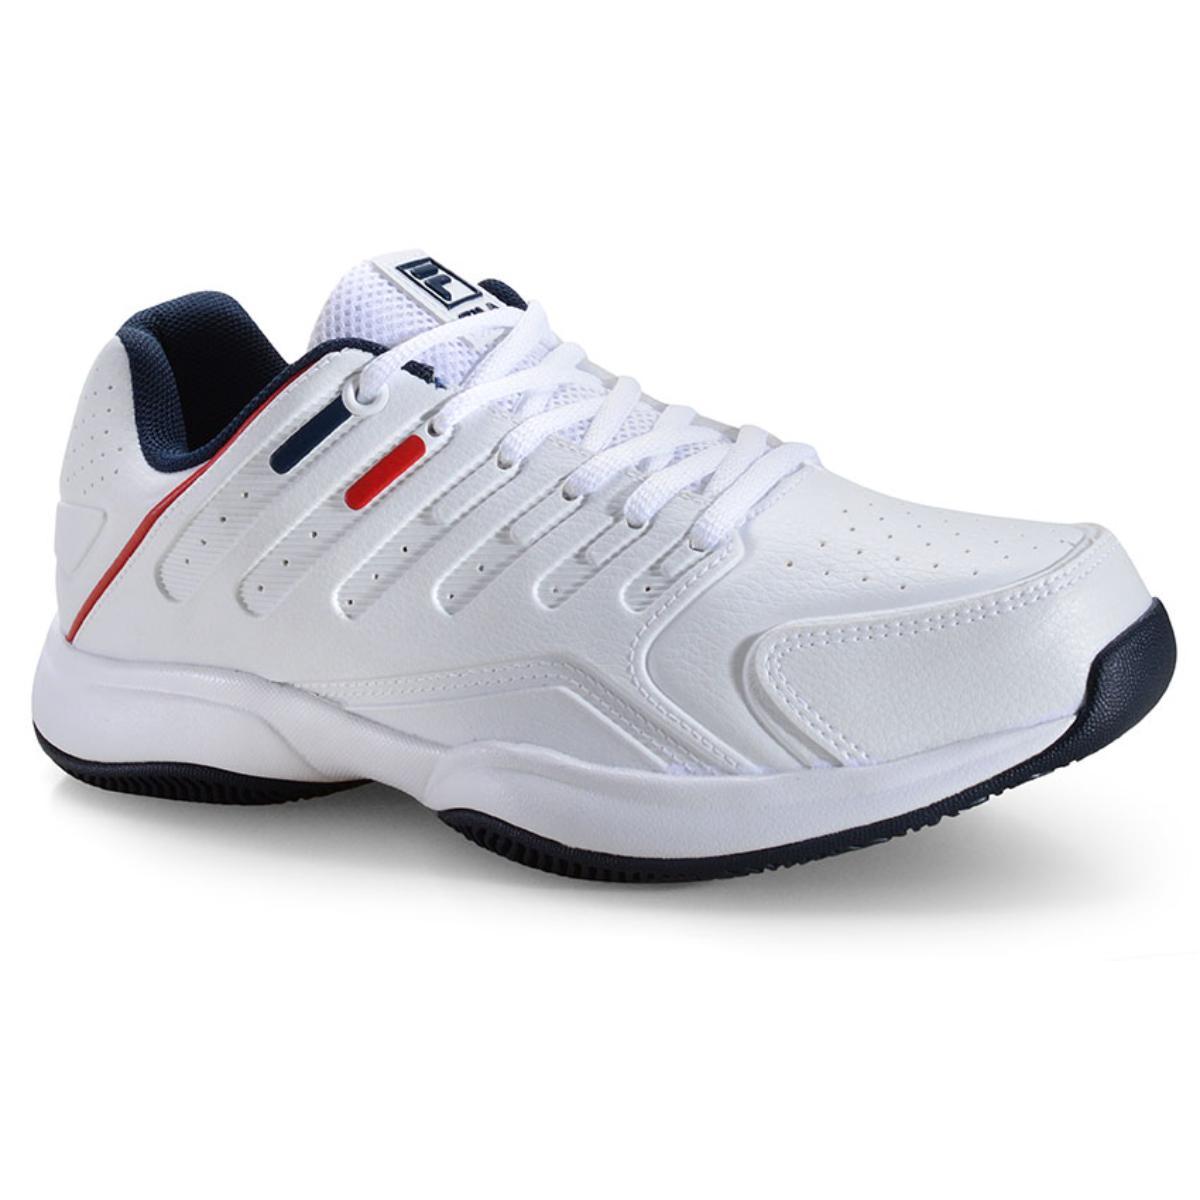 Tênis Masculino Fila 12t054.156 Branco/marinho/vermelho